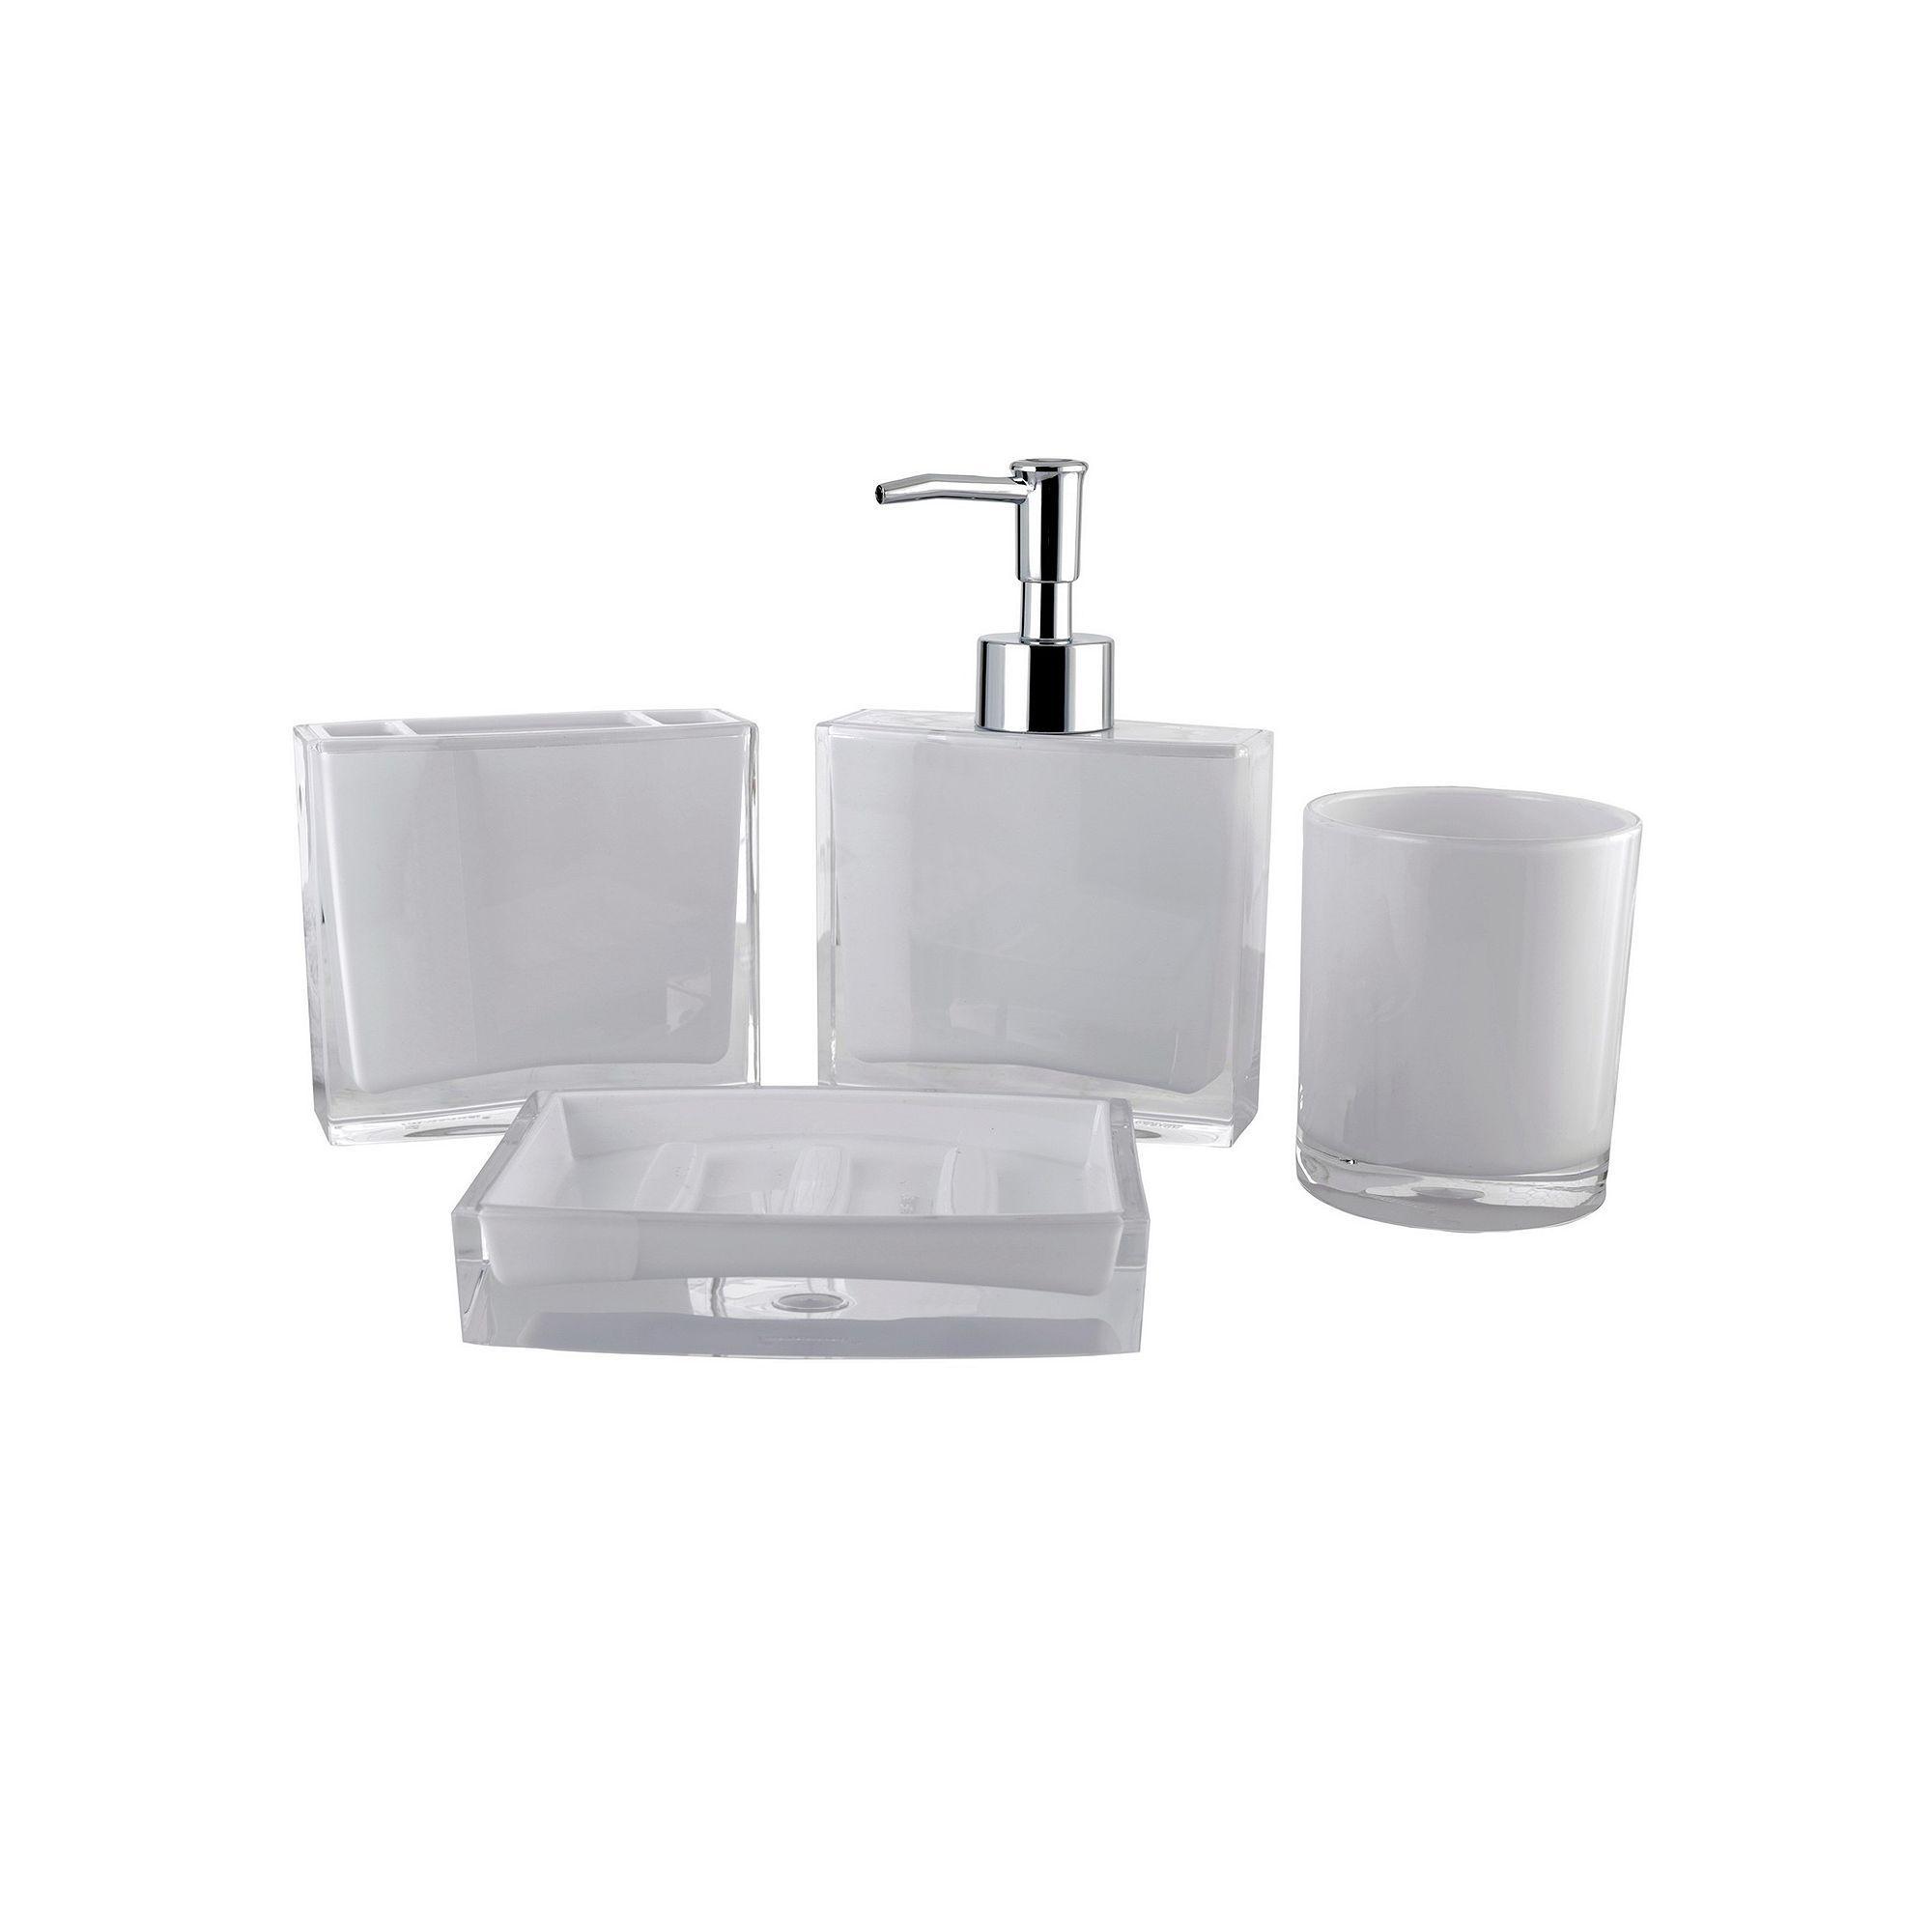 Contemporary 4-piece Bathroom Accessories Set, White | Bathroom ...